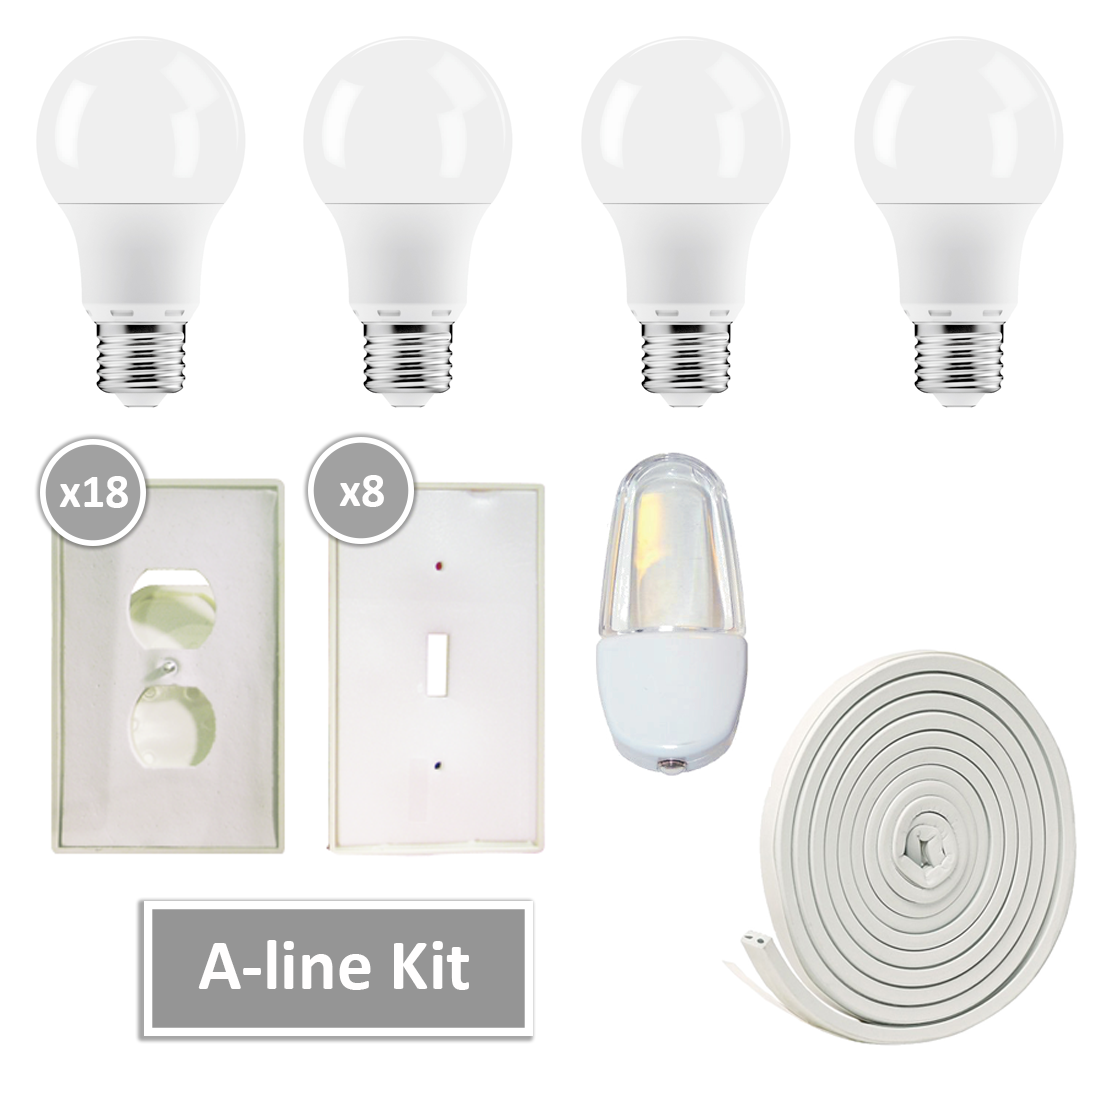 A-line LED Kit